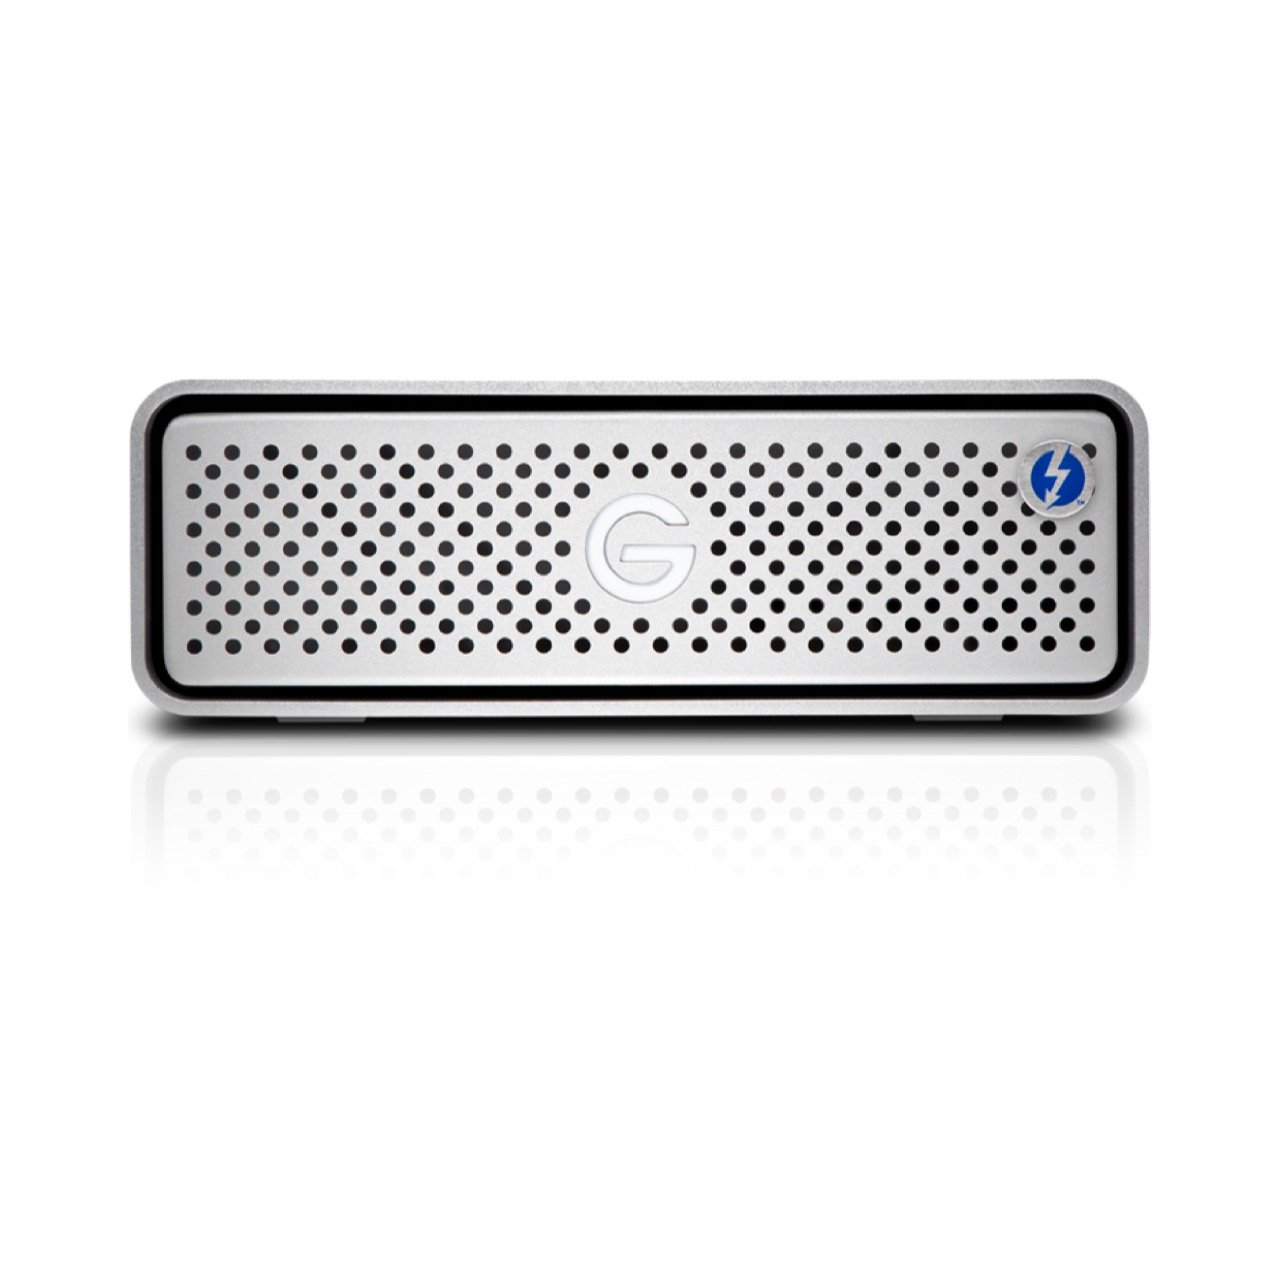 G-Technology G-Drive with Thunderbolt 3 / USB-C – 4 0 TB